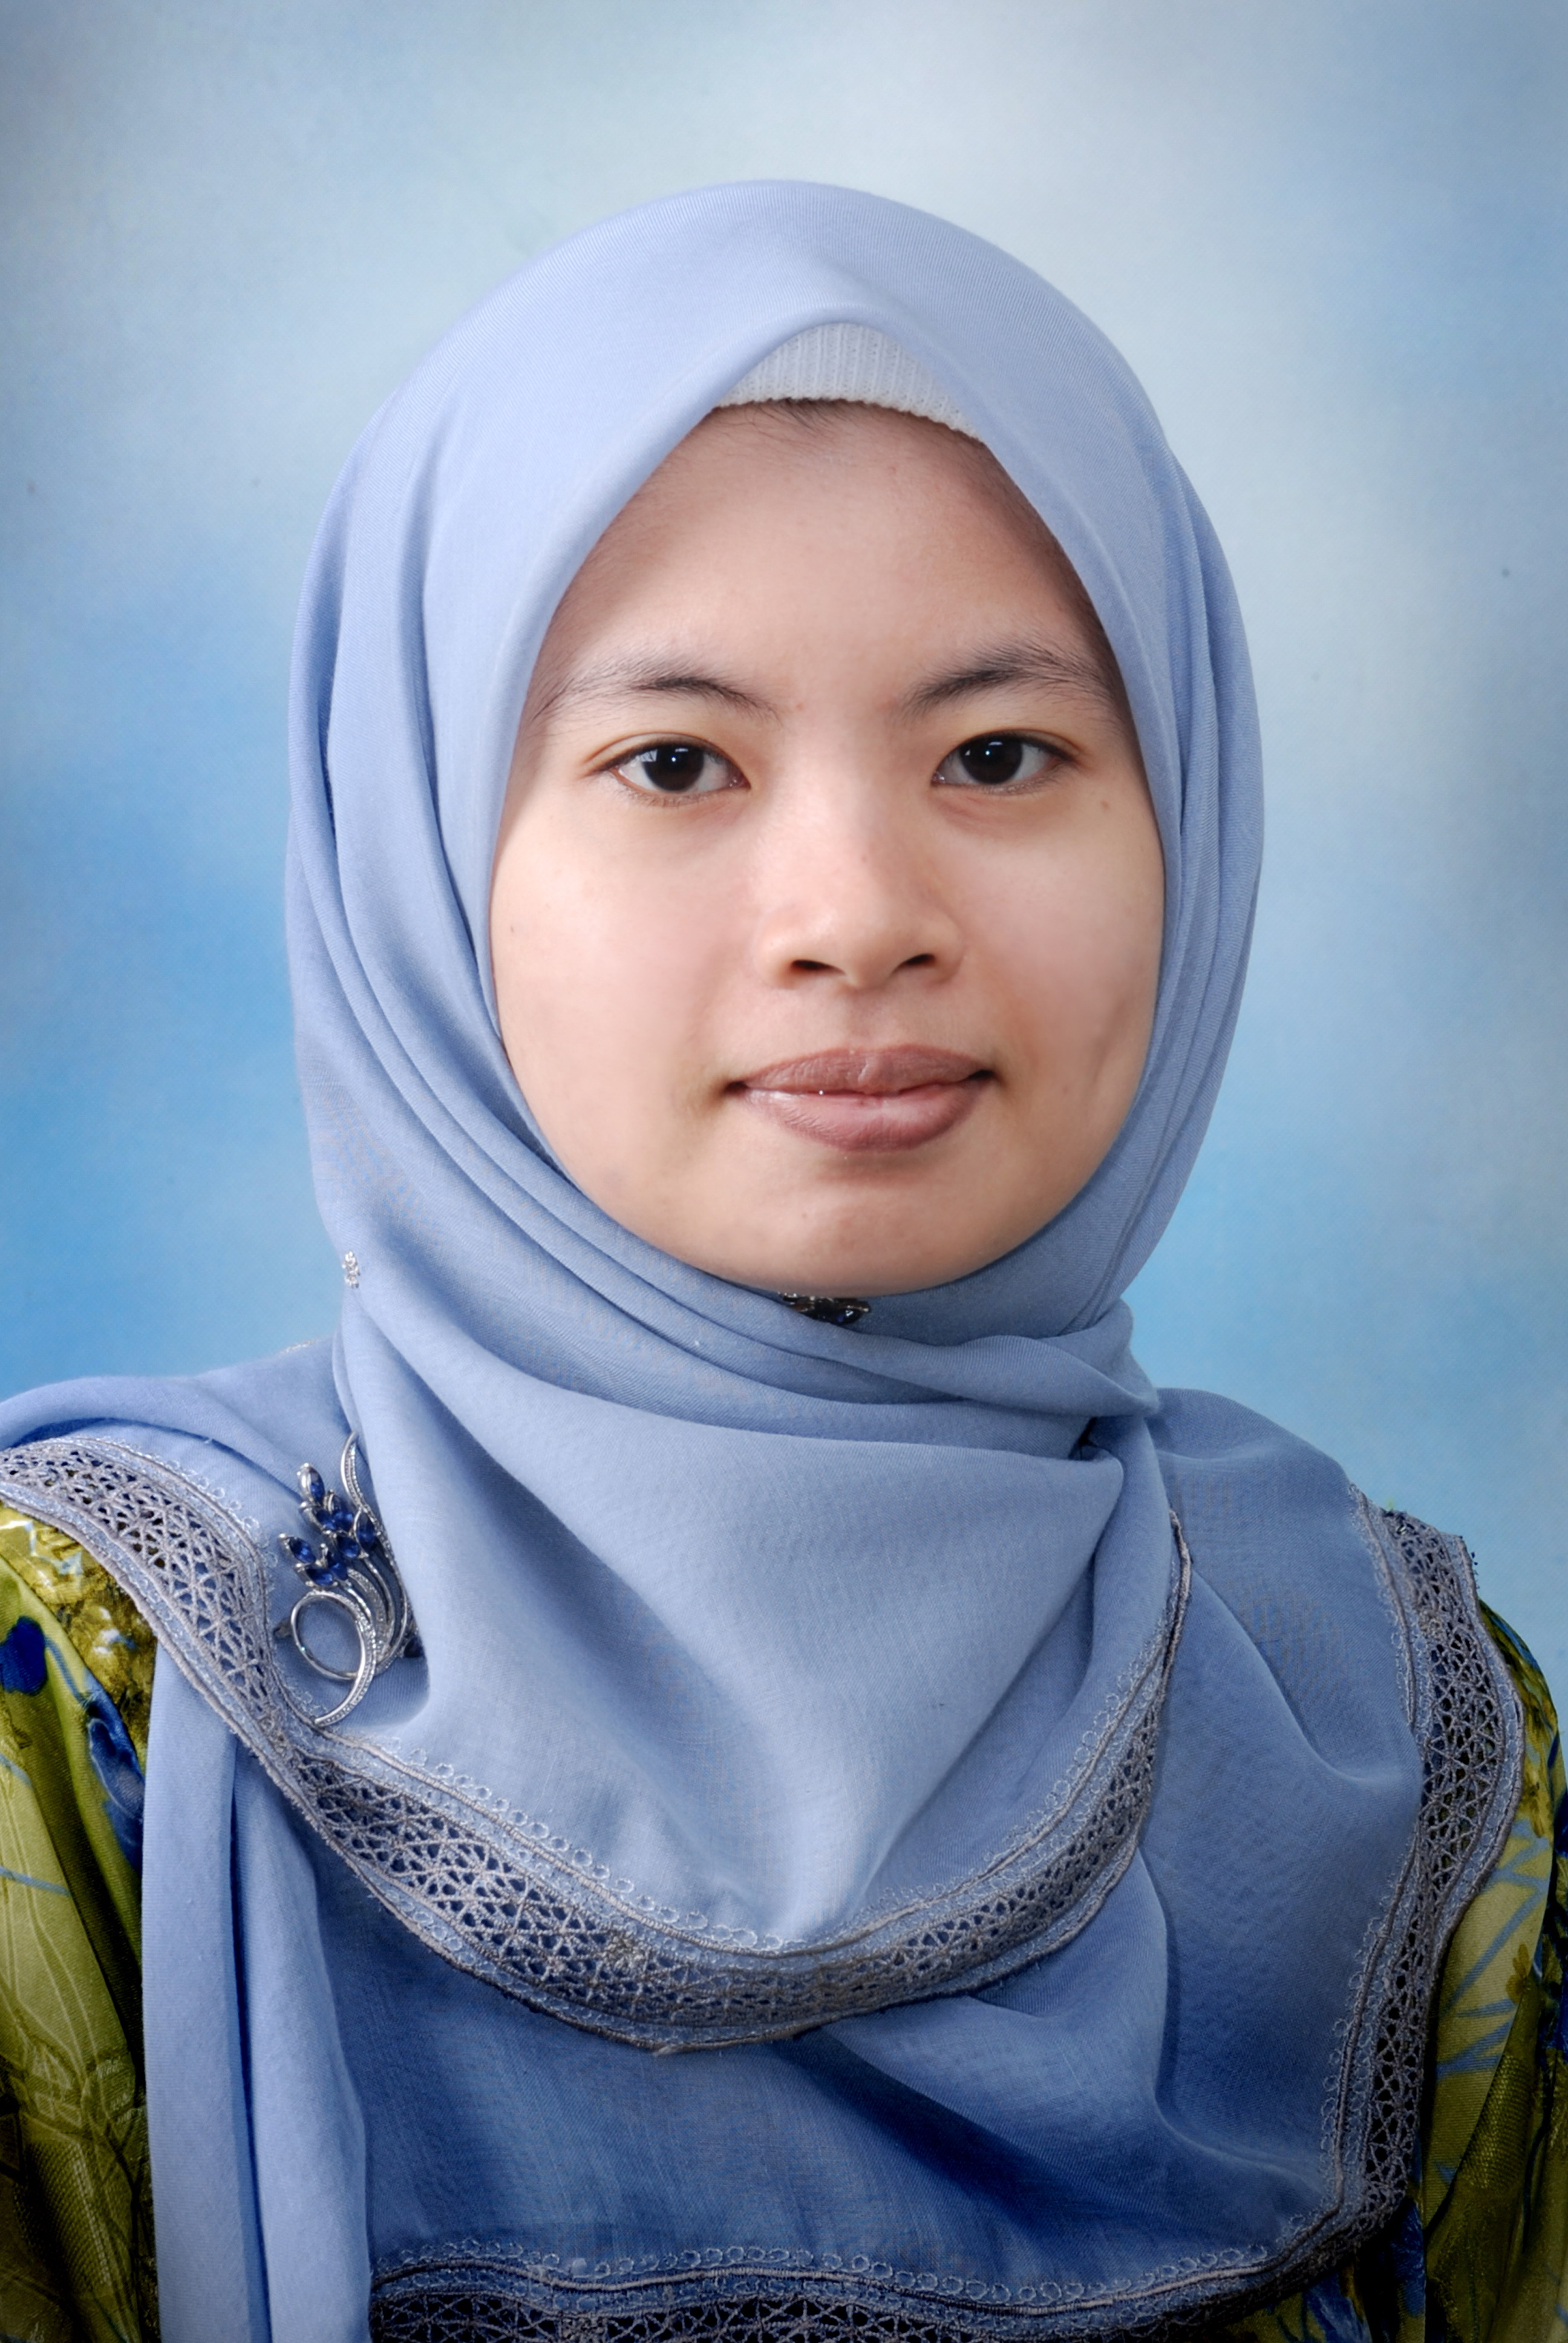 Dr. Marina bt. Mubin